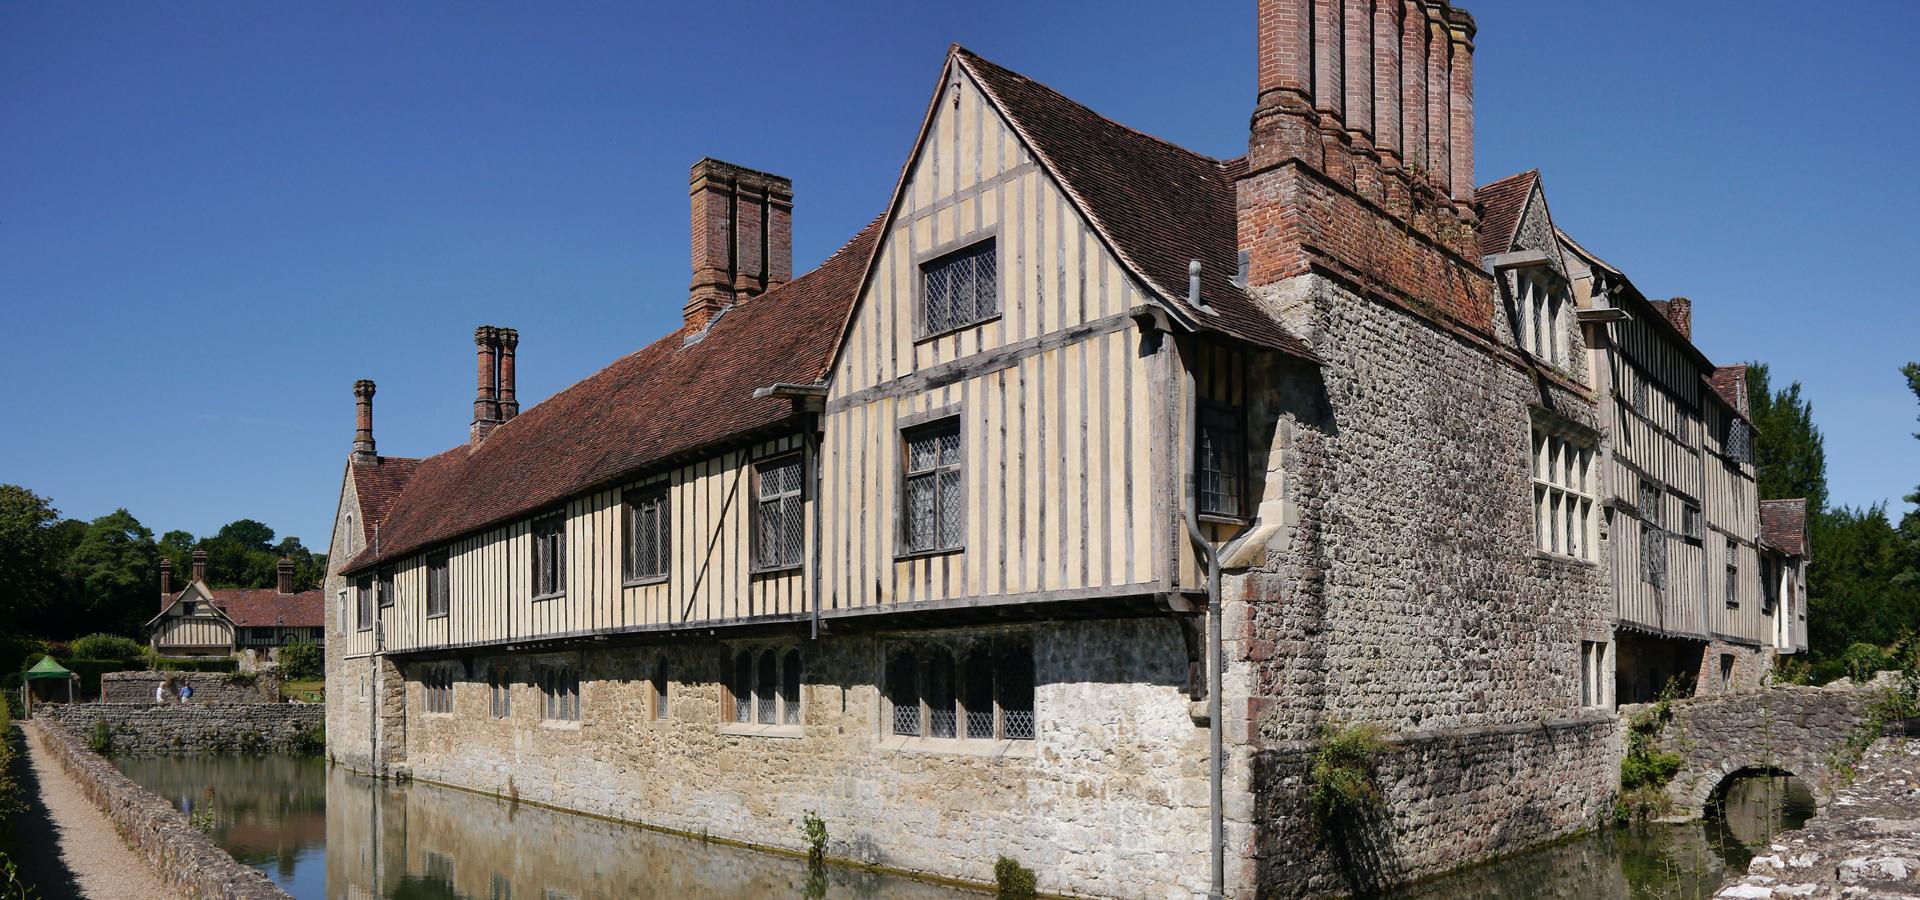 Peer-to-peer advisory in Sevenoaks, Kent, England, Great Britain